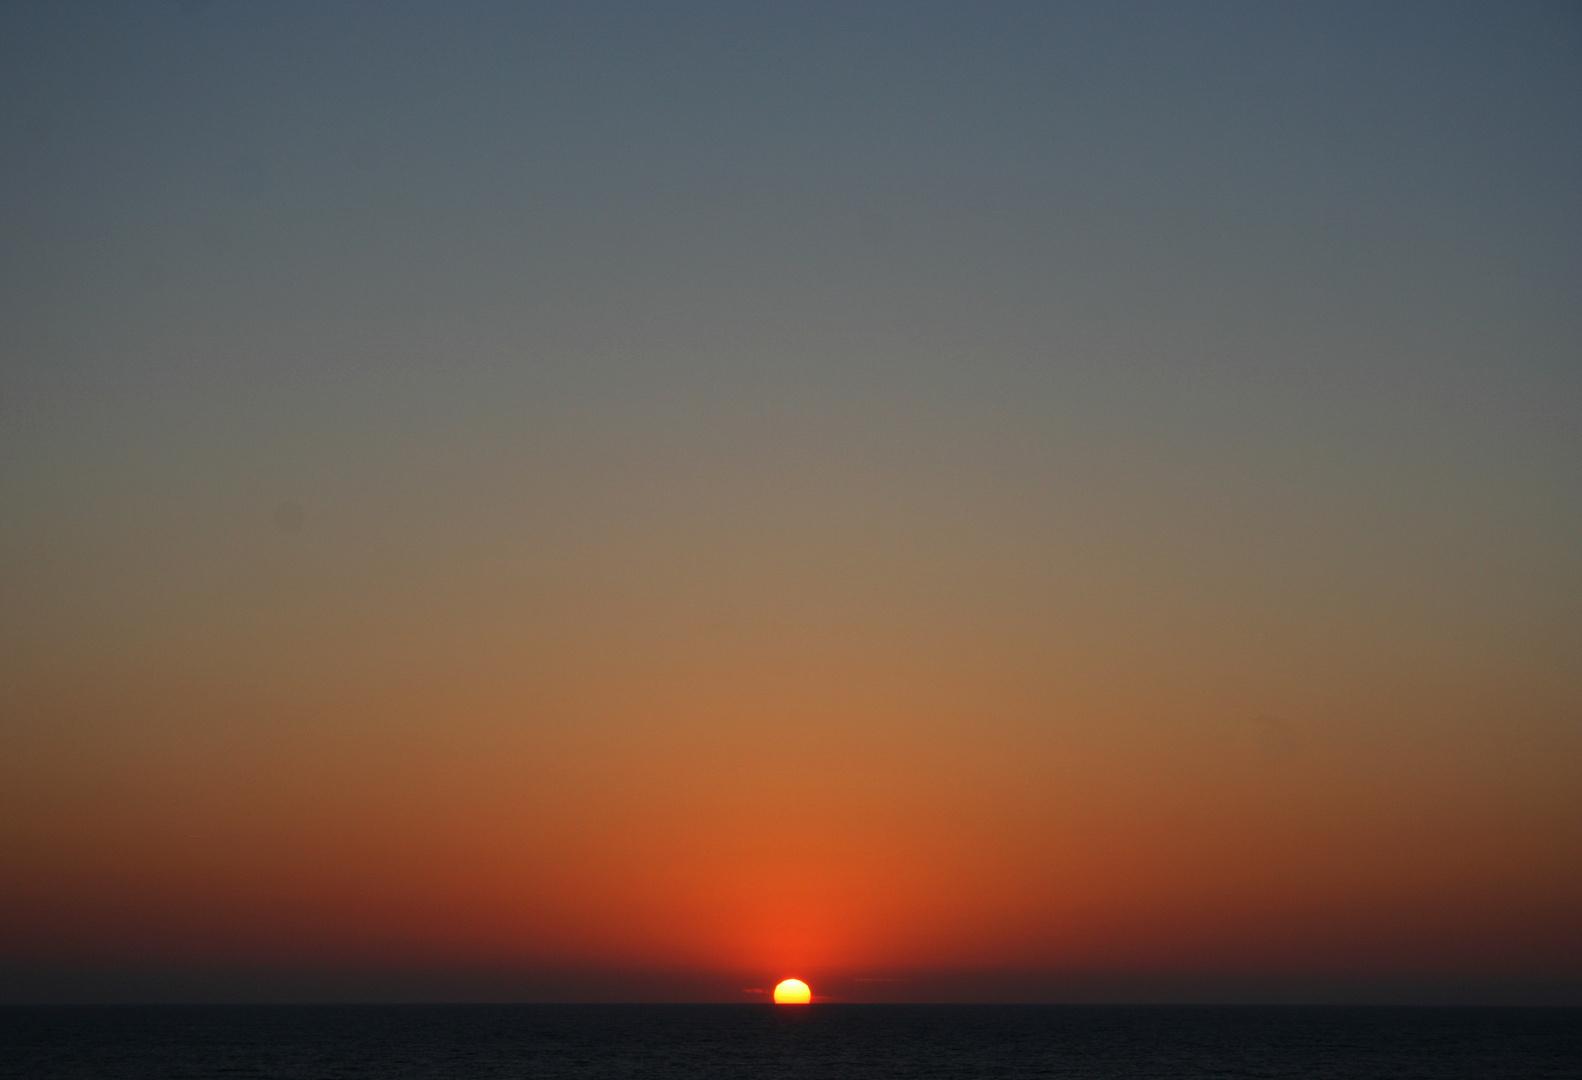 Over the horizon...